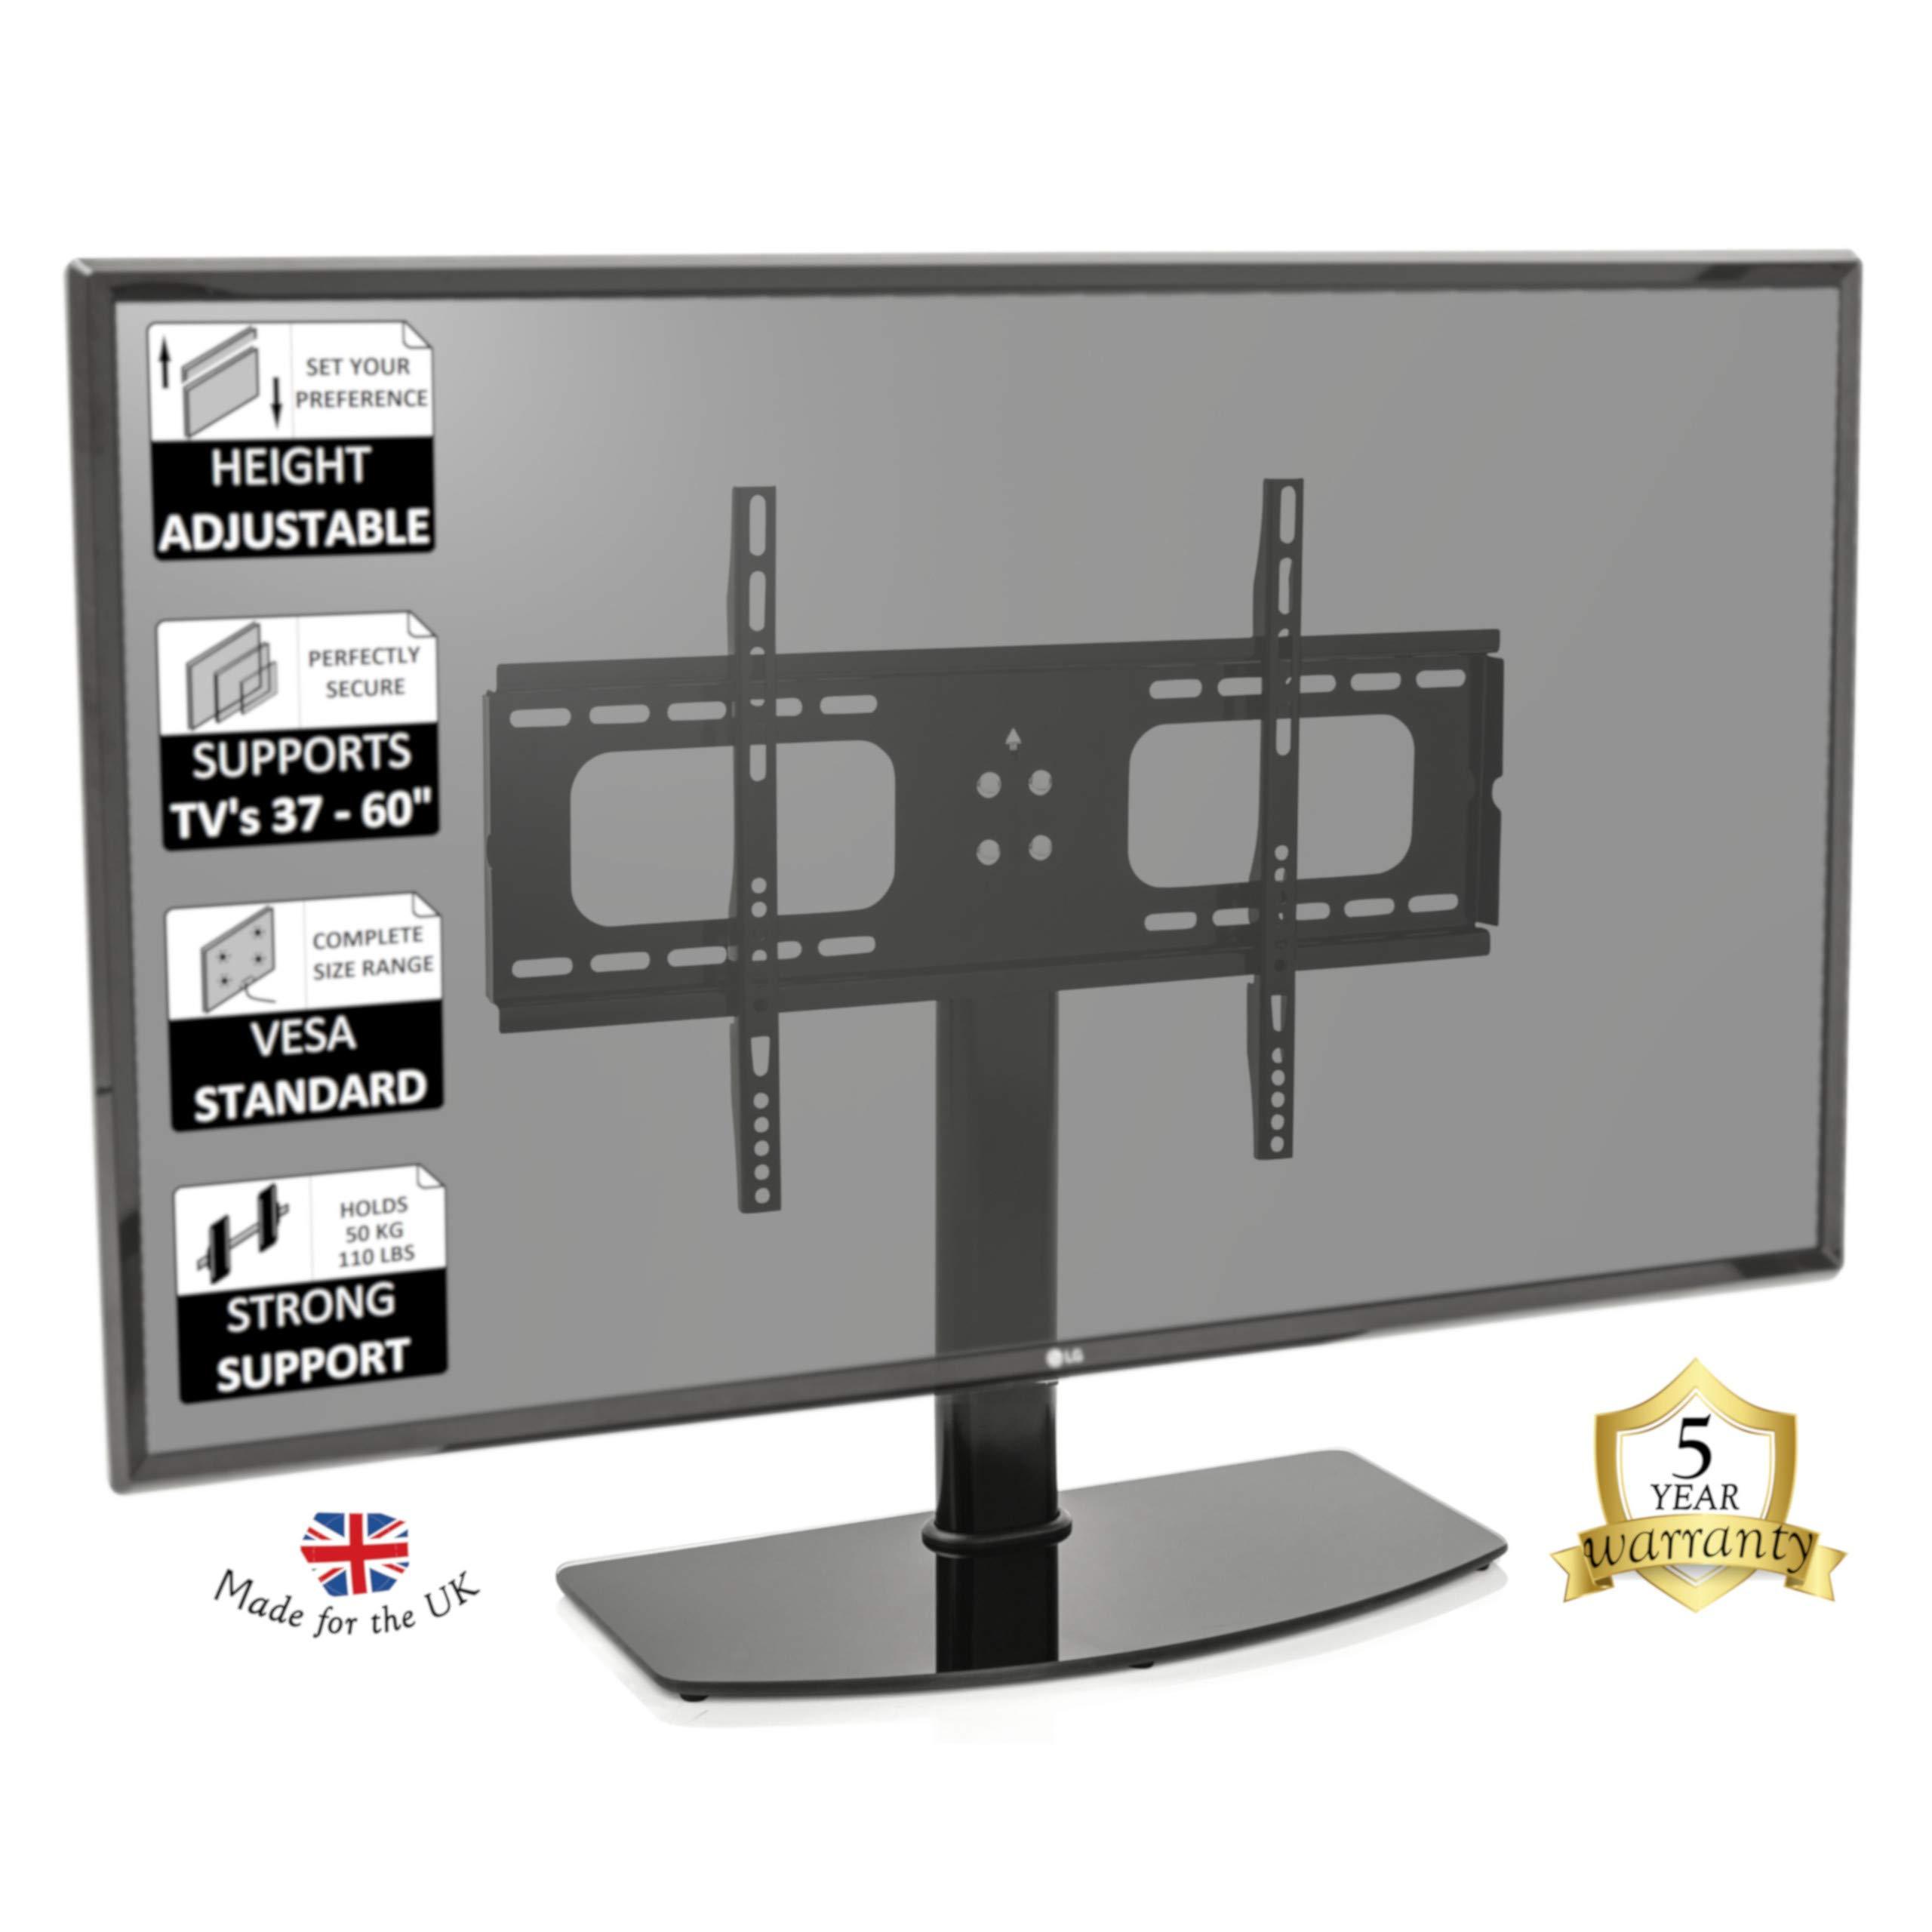 Soporte para televisor Mountright, para televisor LCD, LED y ...